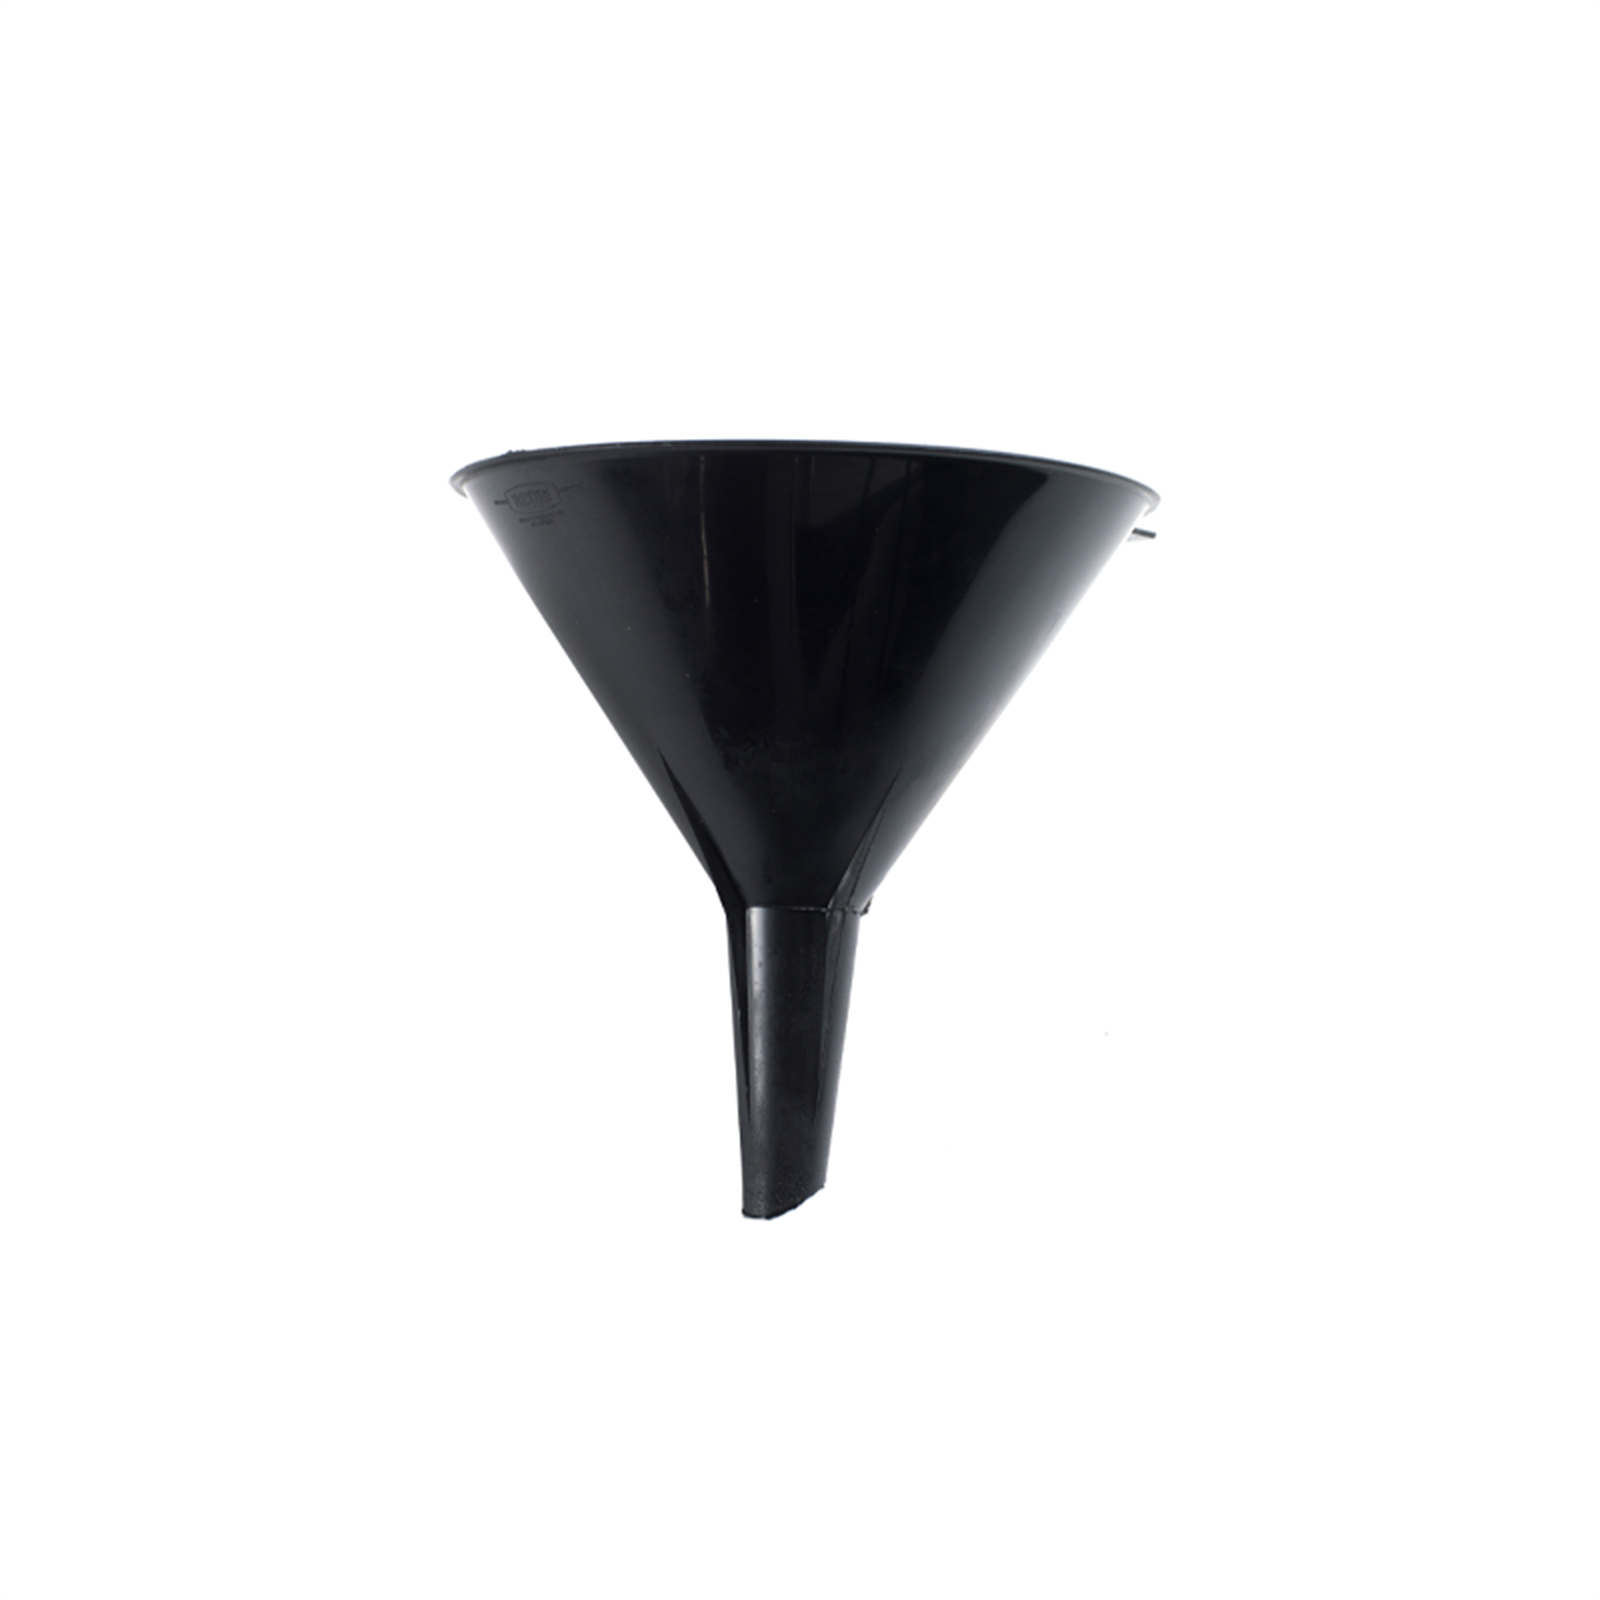 Sandleford 14cm All Purpose Funnel